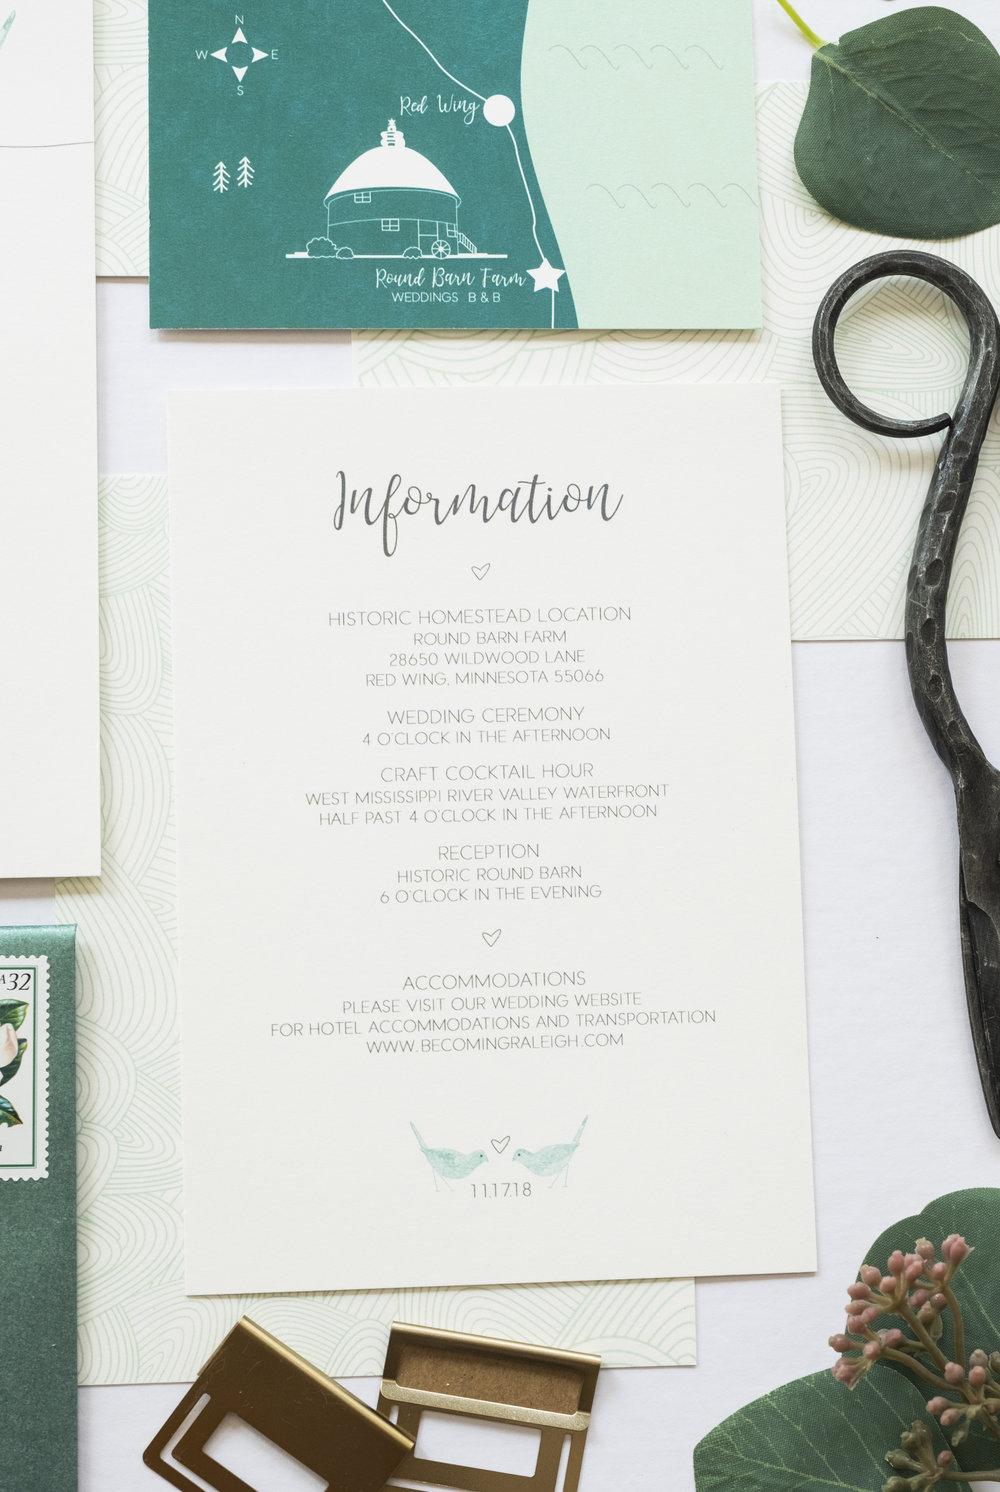 Lovebirds_wedding_invitation_custom_huntwrightdesignco_007.JPG